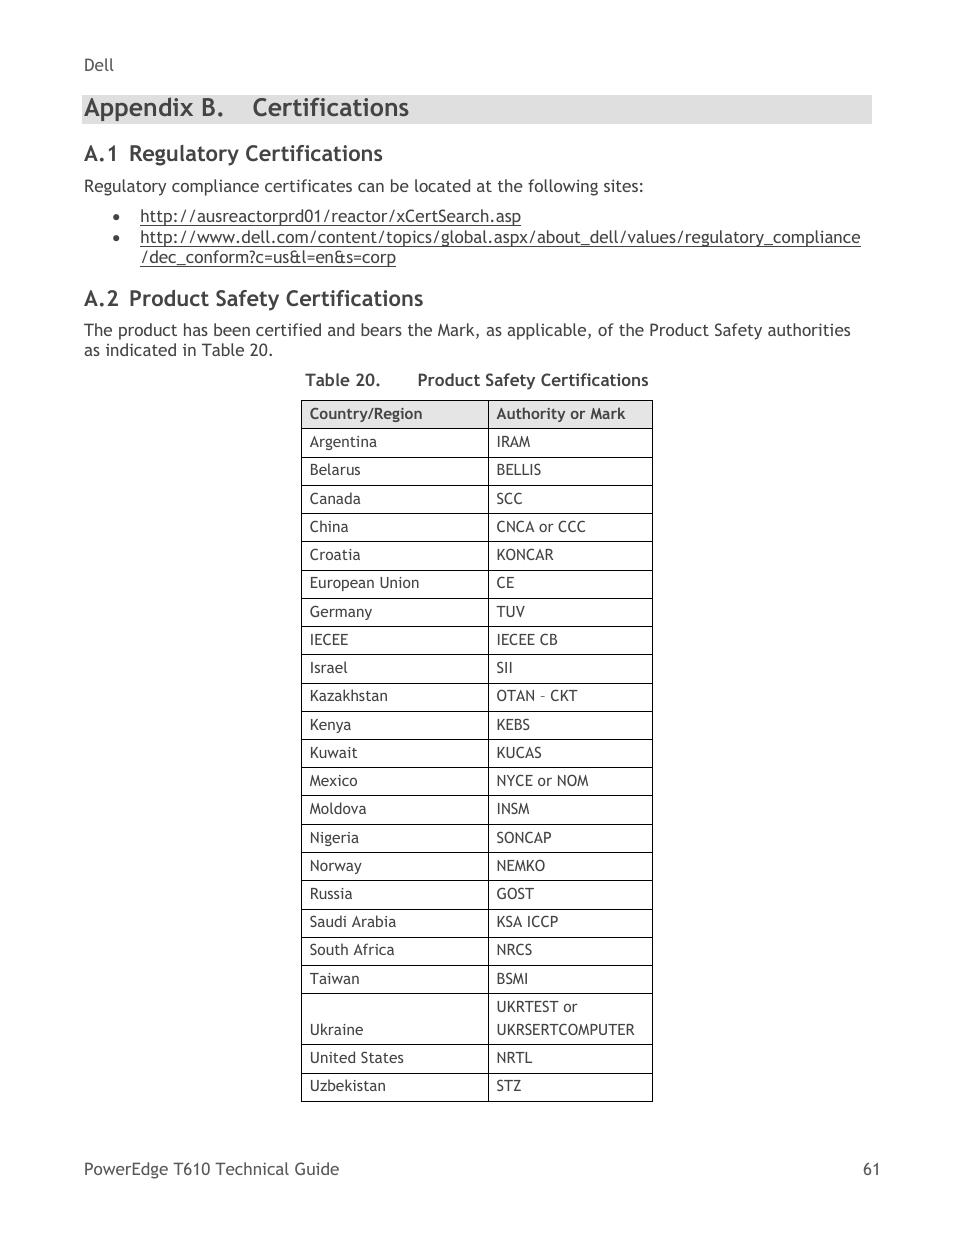 Appendix B Certifications Regulatory Certifications Dell